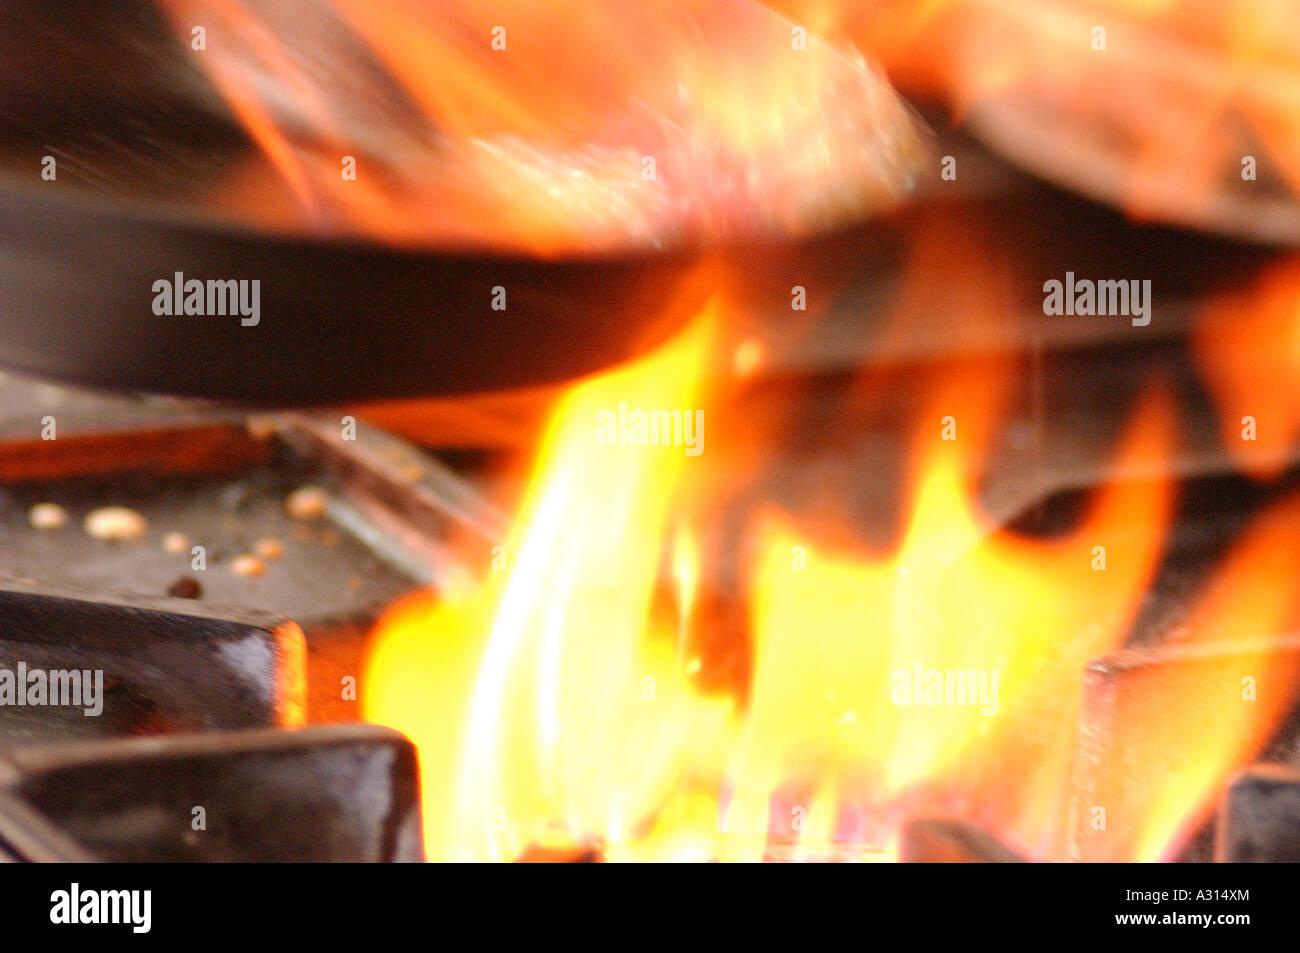 Fire Cooking Flames Utensil Stockfotos & Fire Cooking Flames Utensil ...